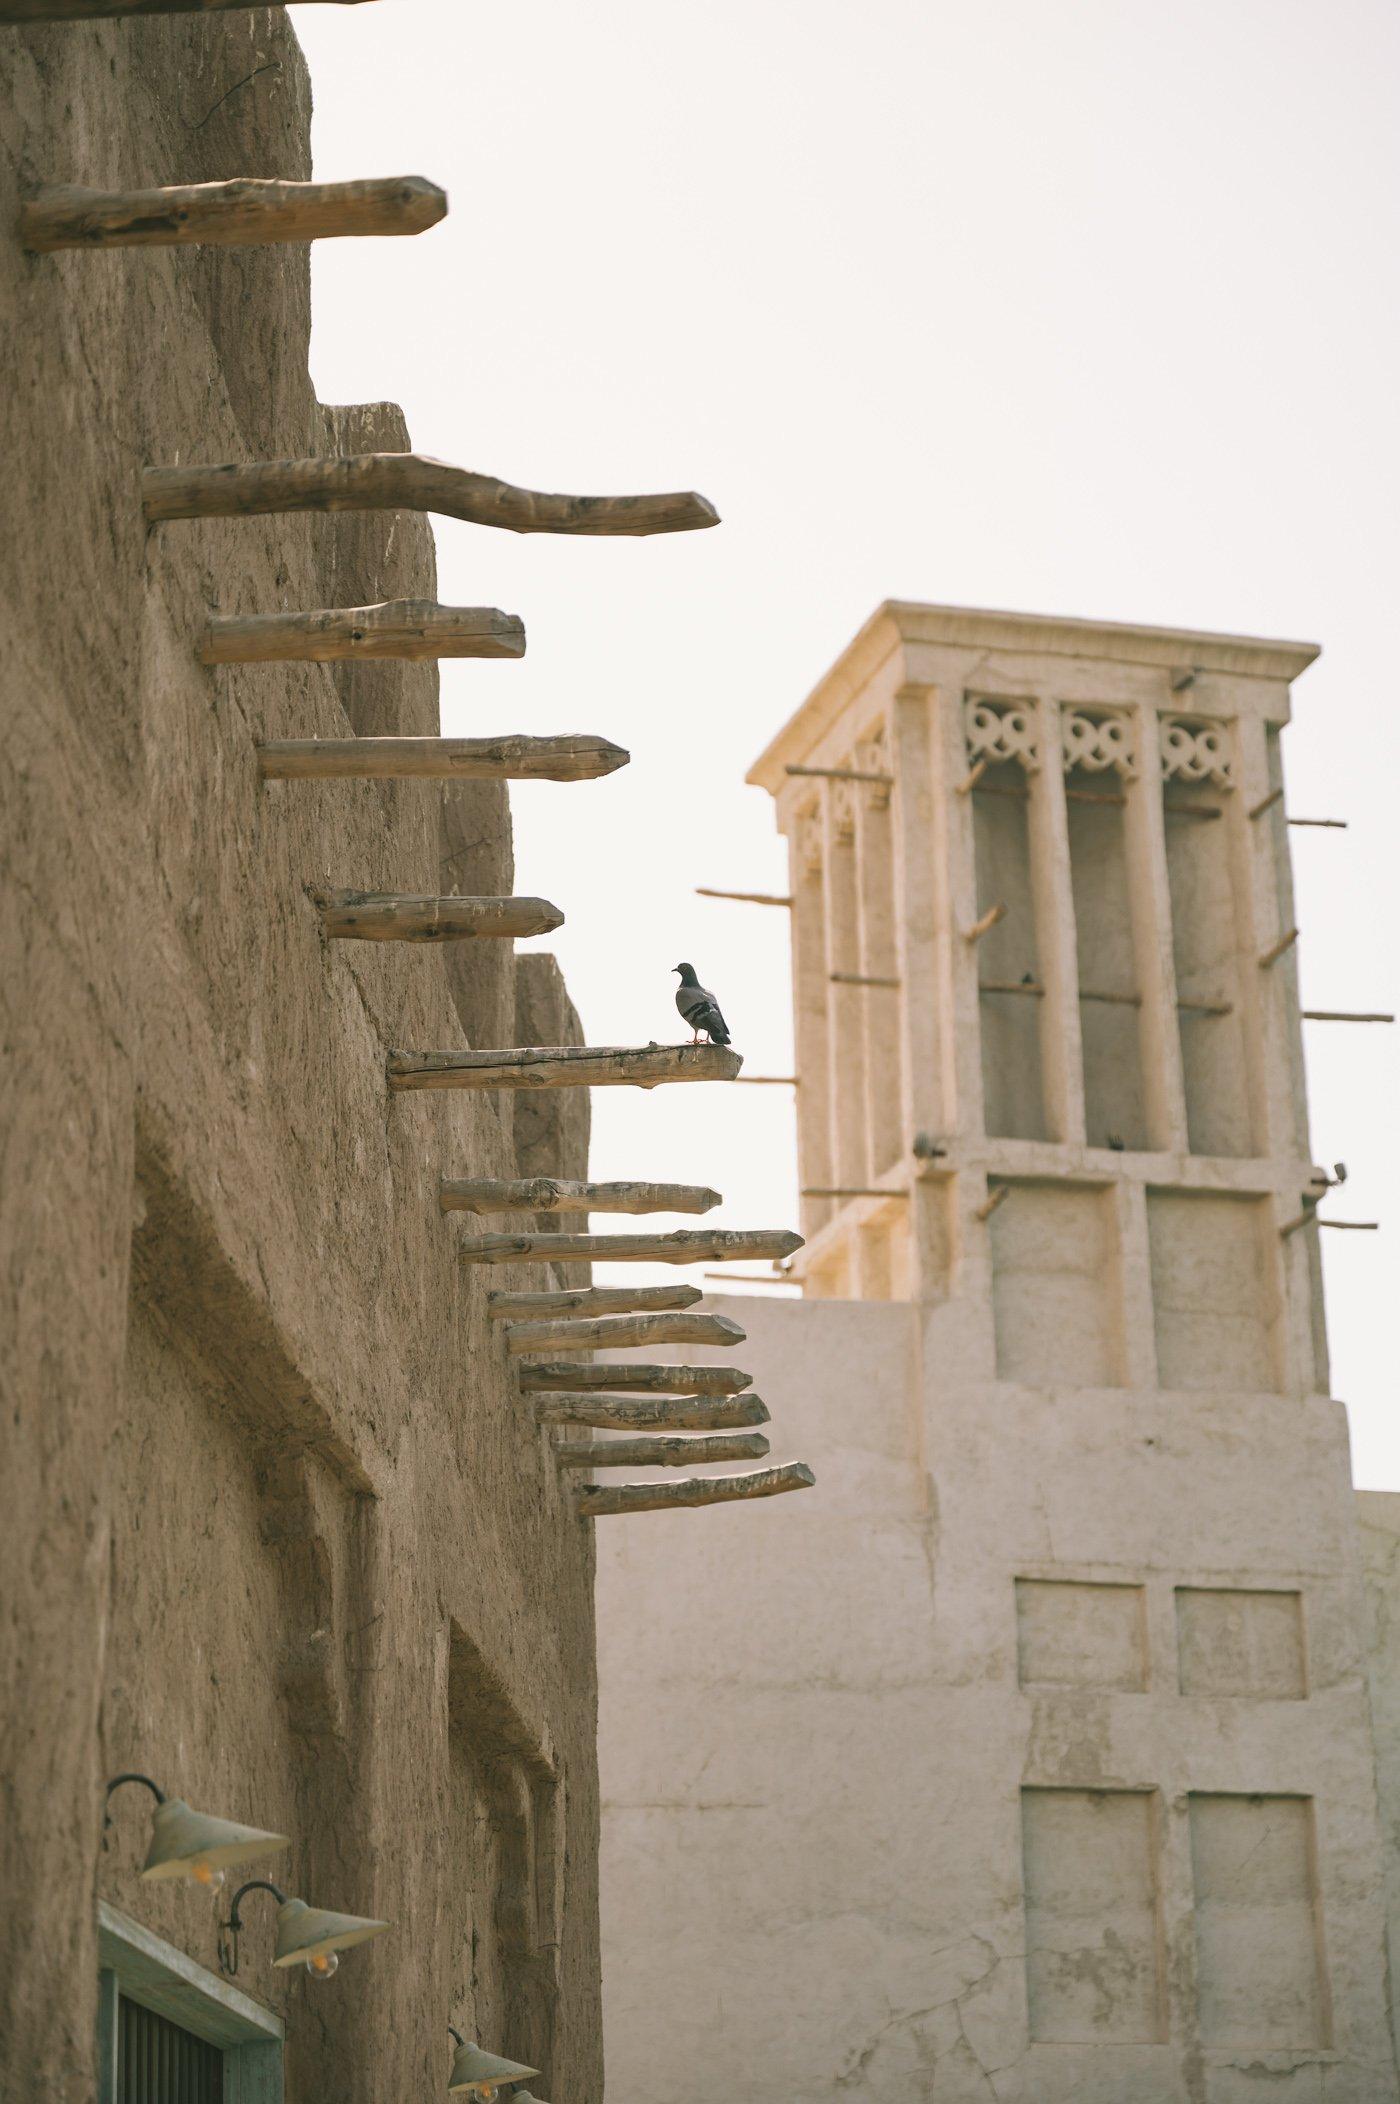 Al Seef neighbourhood in Dubai